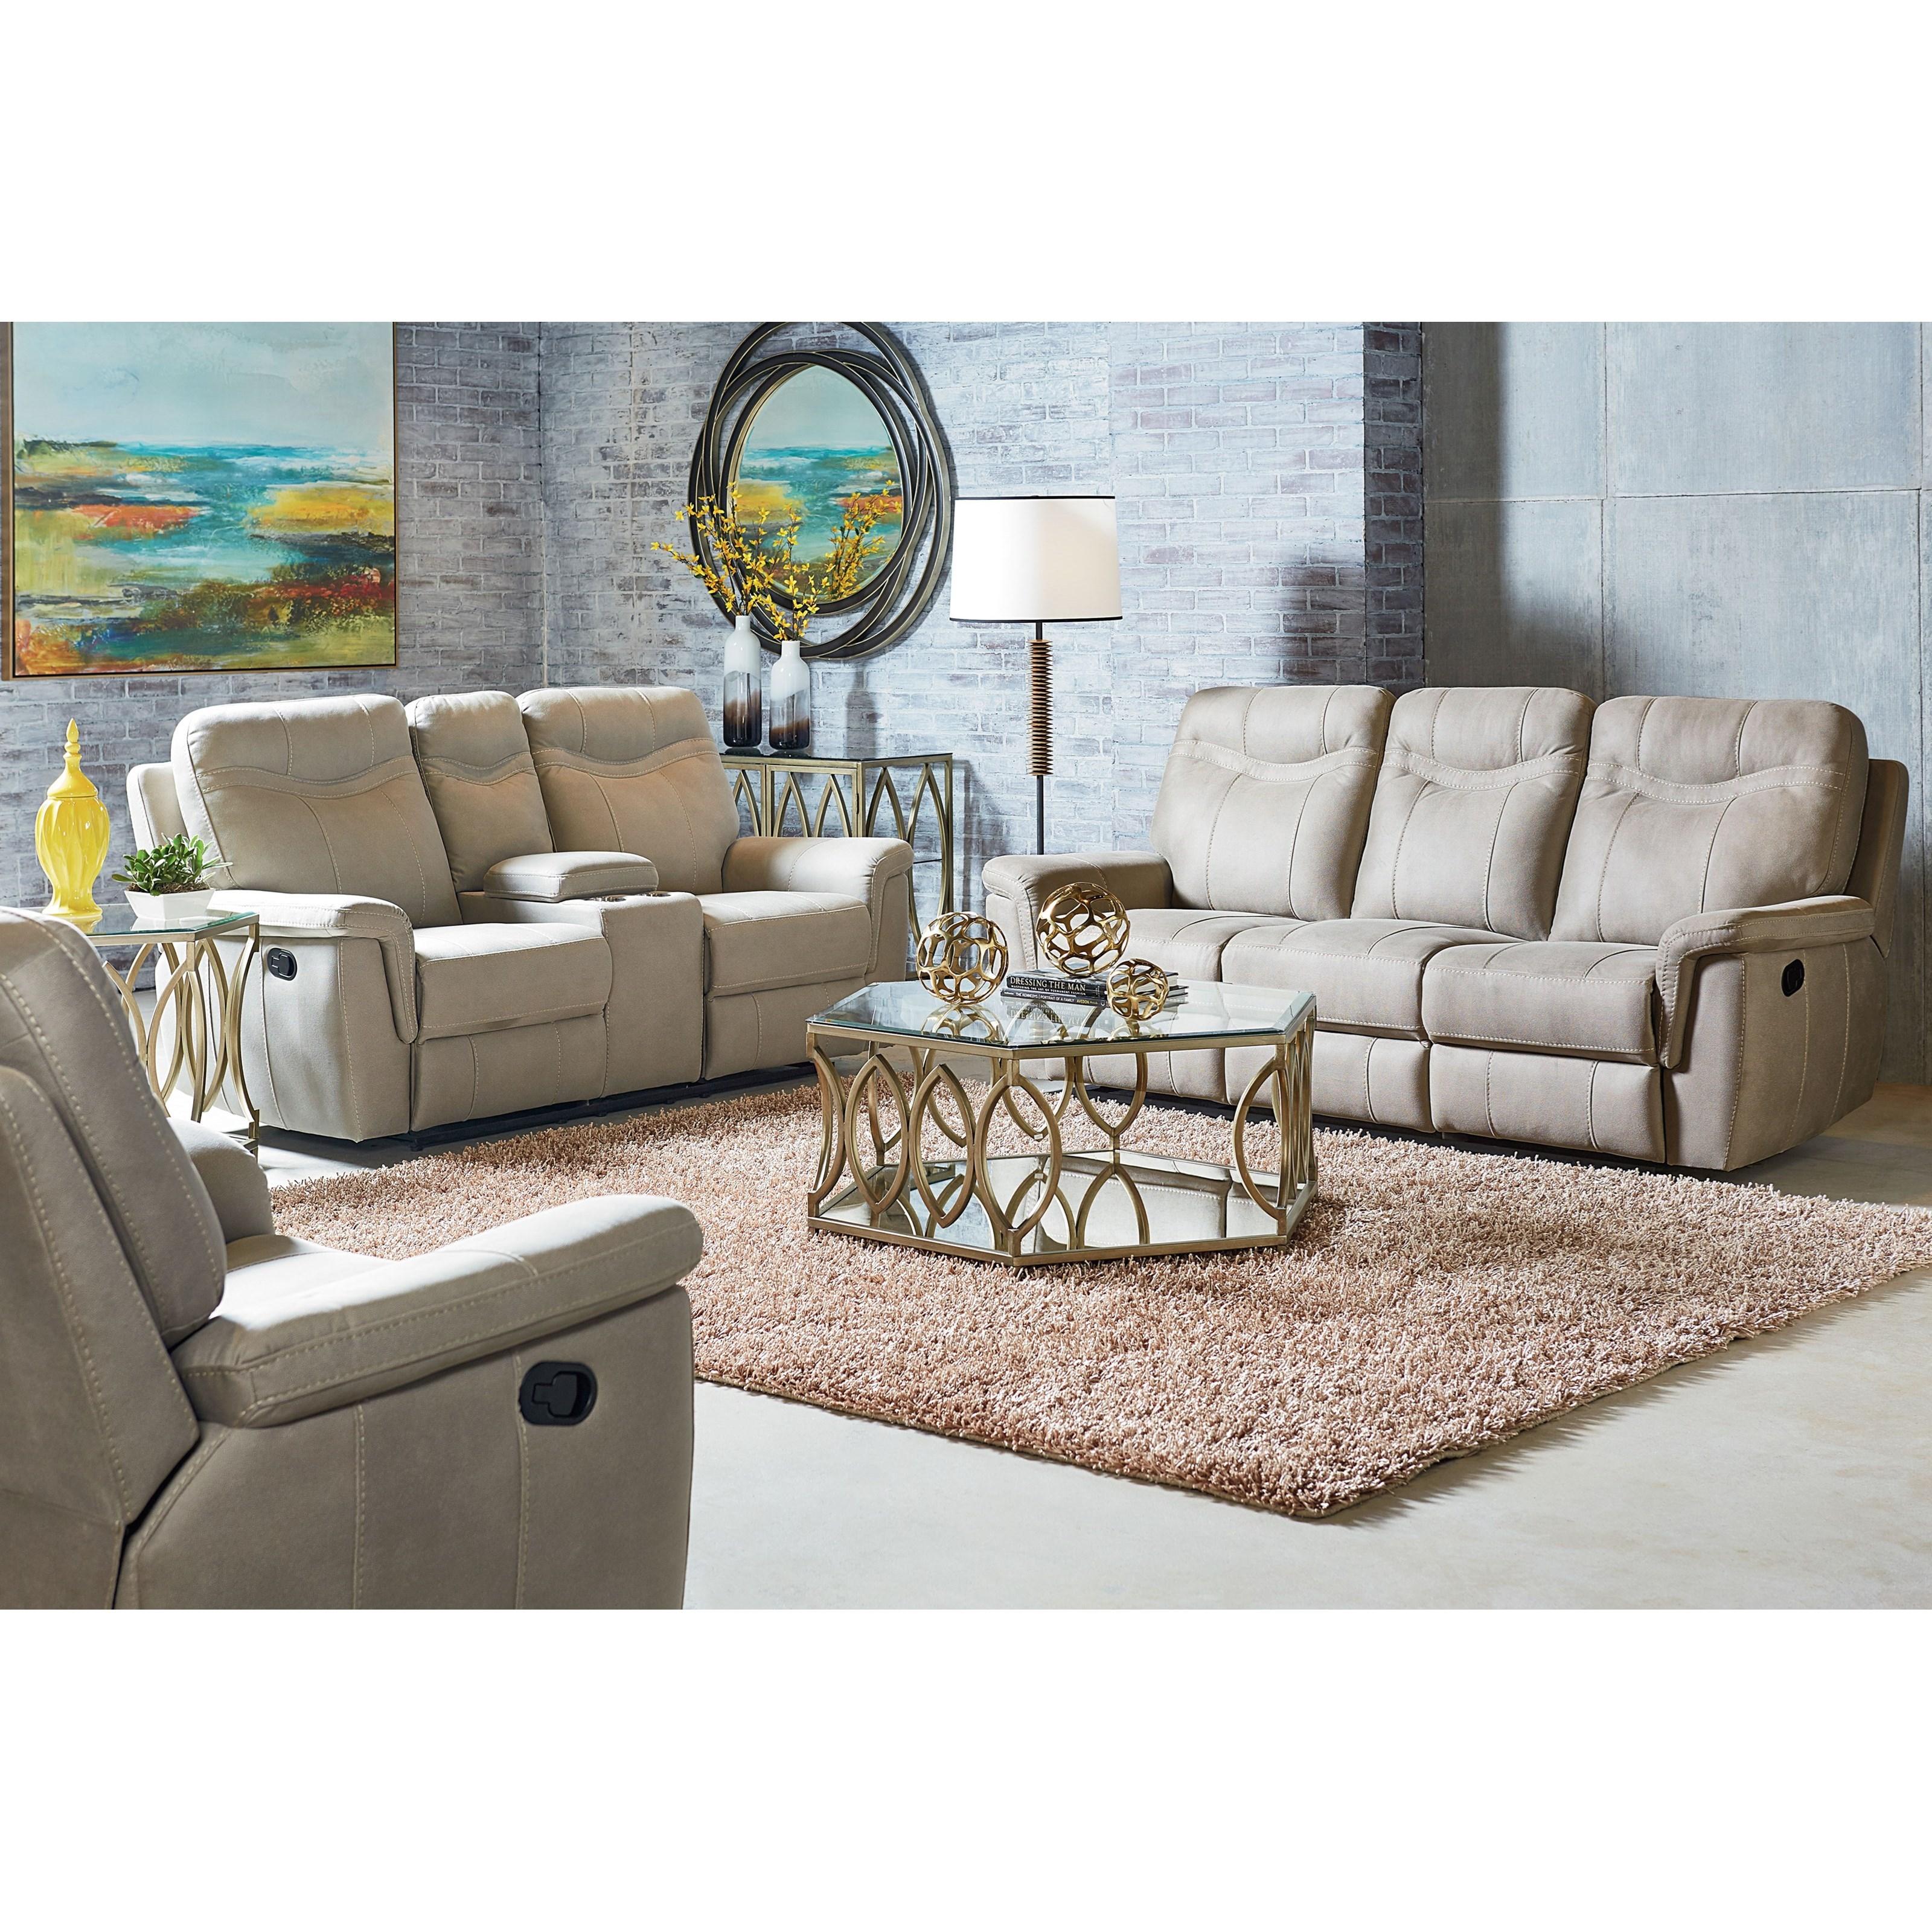 Standard Furniture Boardwalk Reclining Living Room Group Dunk Bright Furniture Reclining